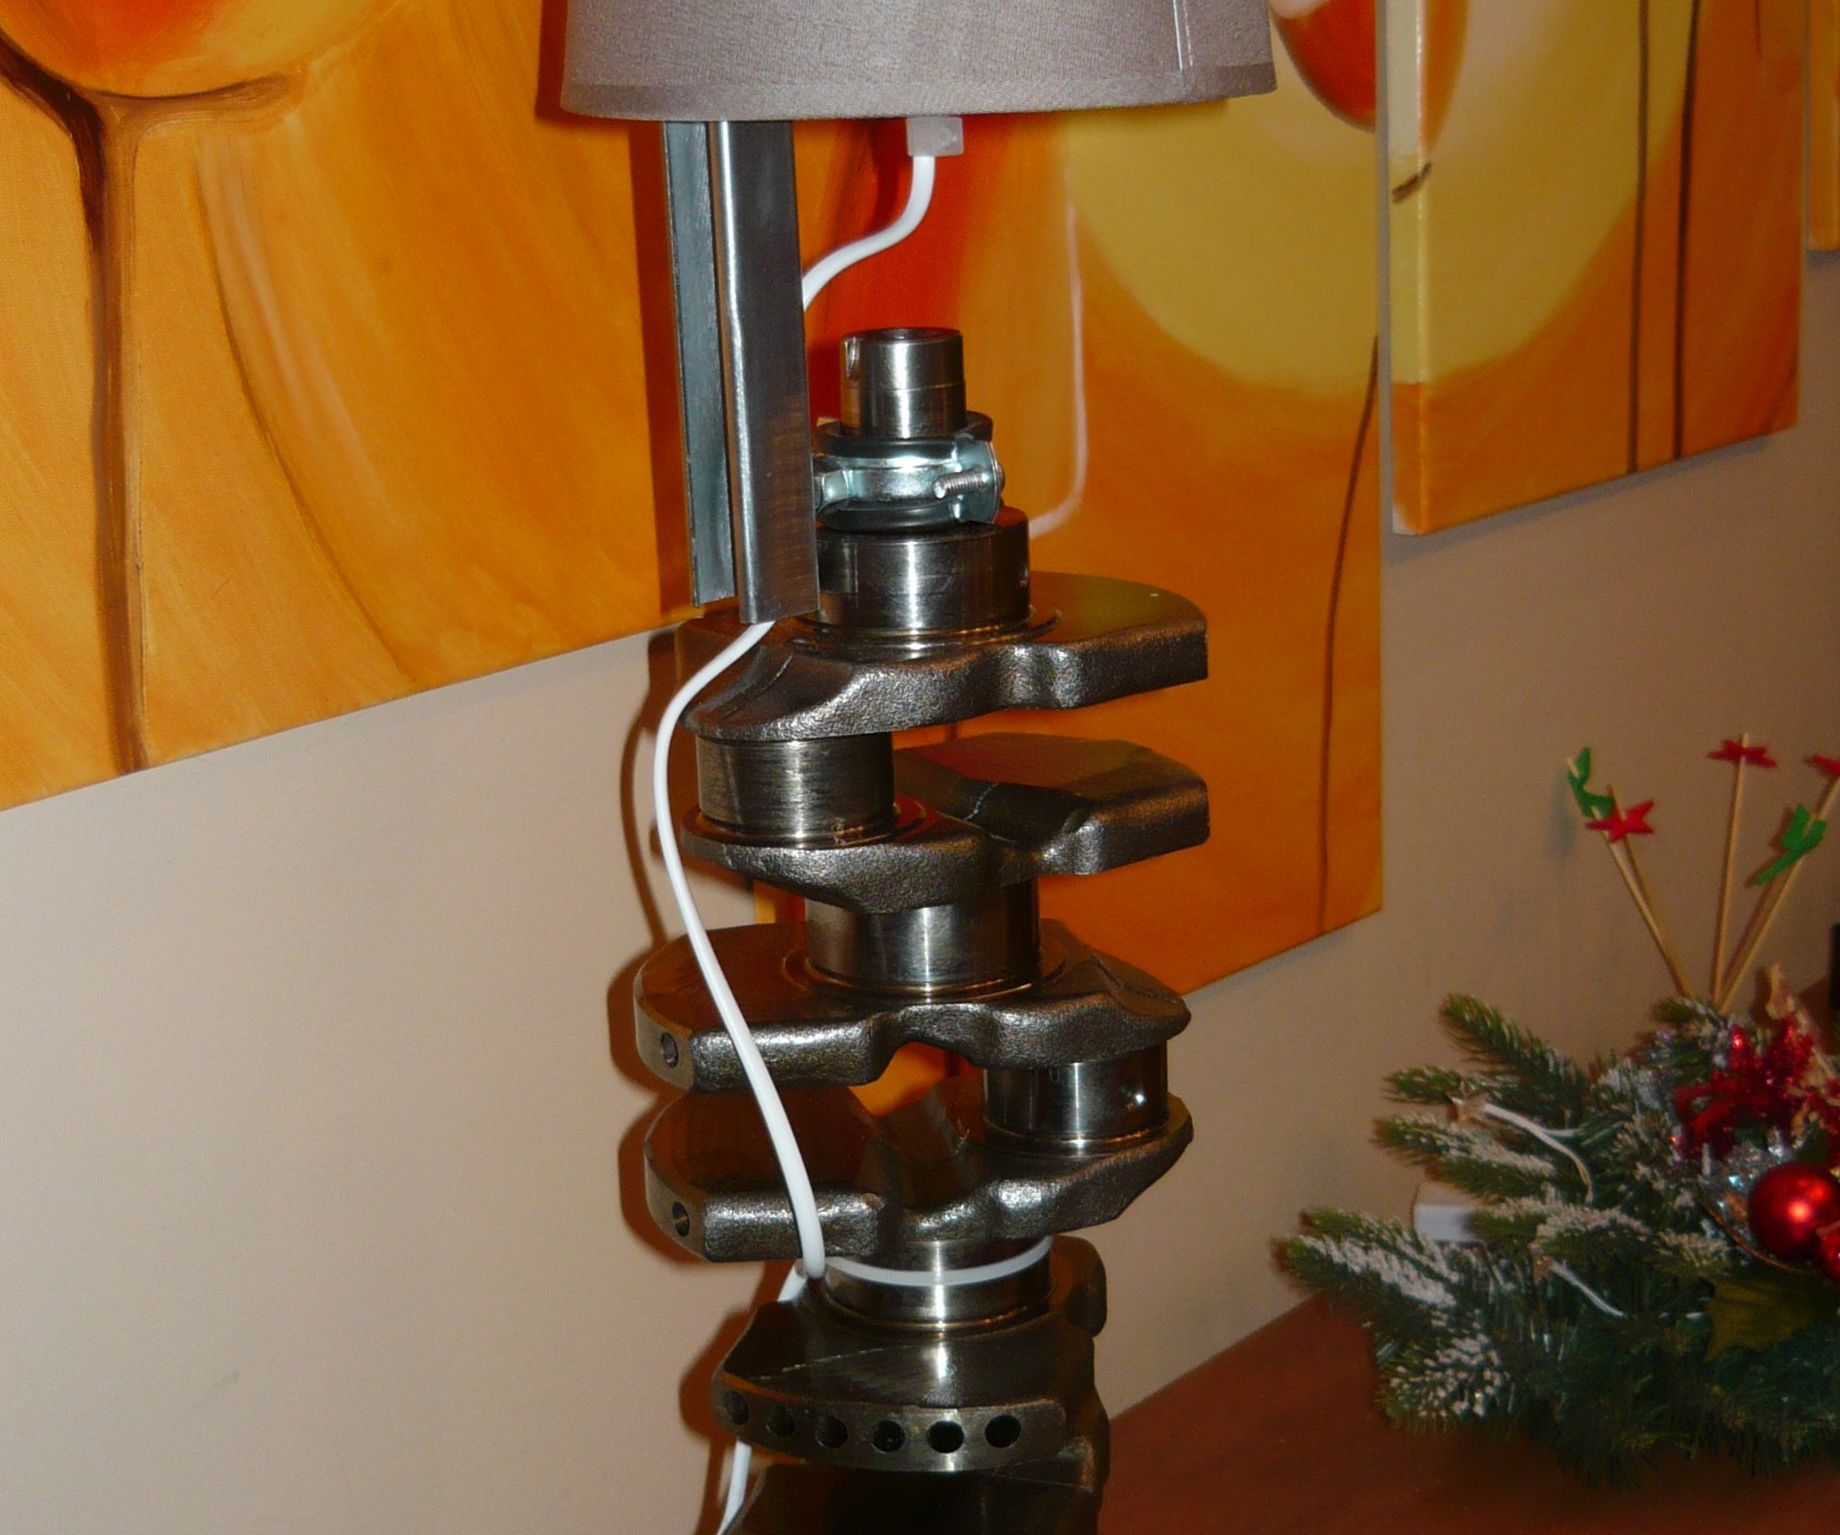 Lancia Lybra crankshaft table lamp